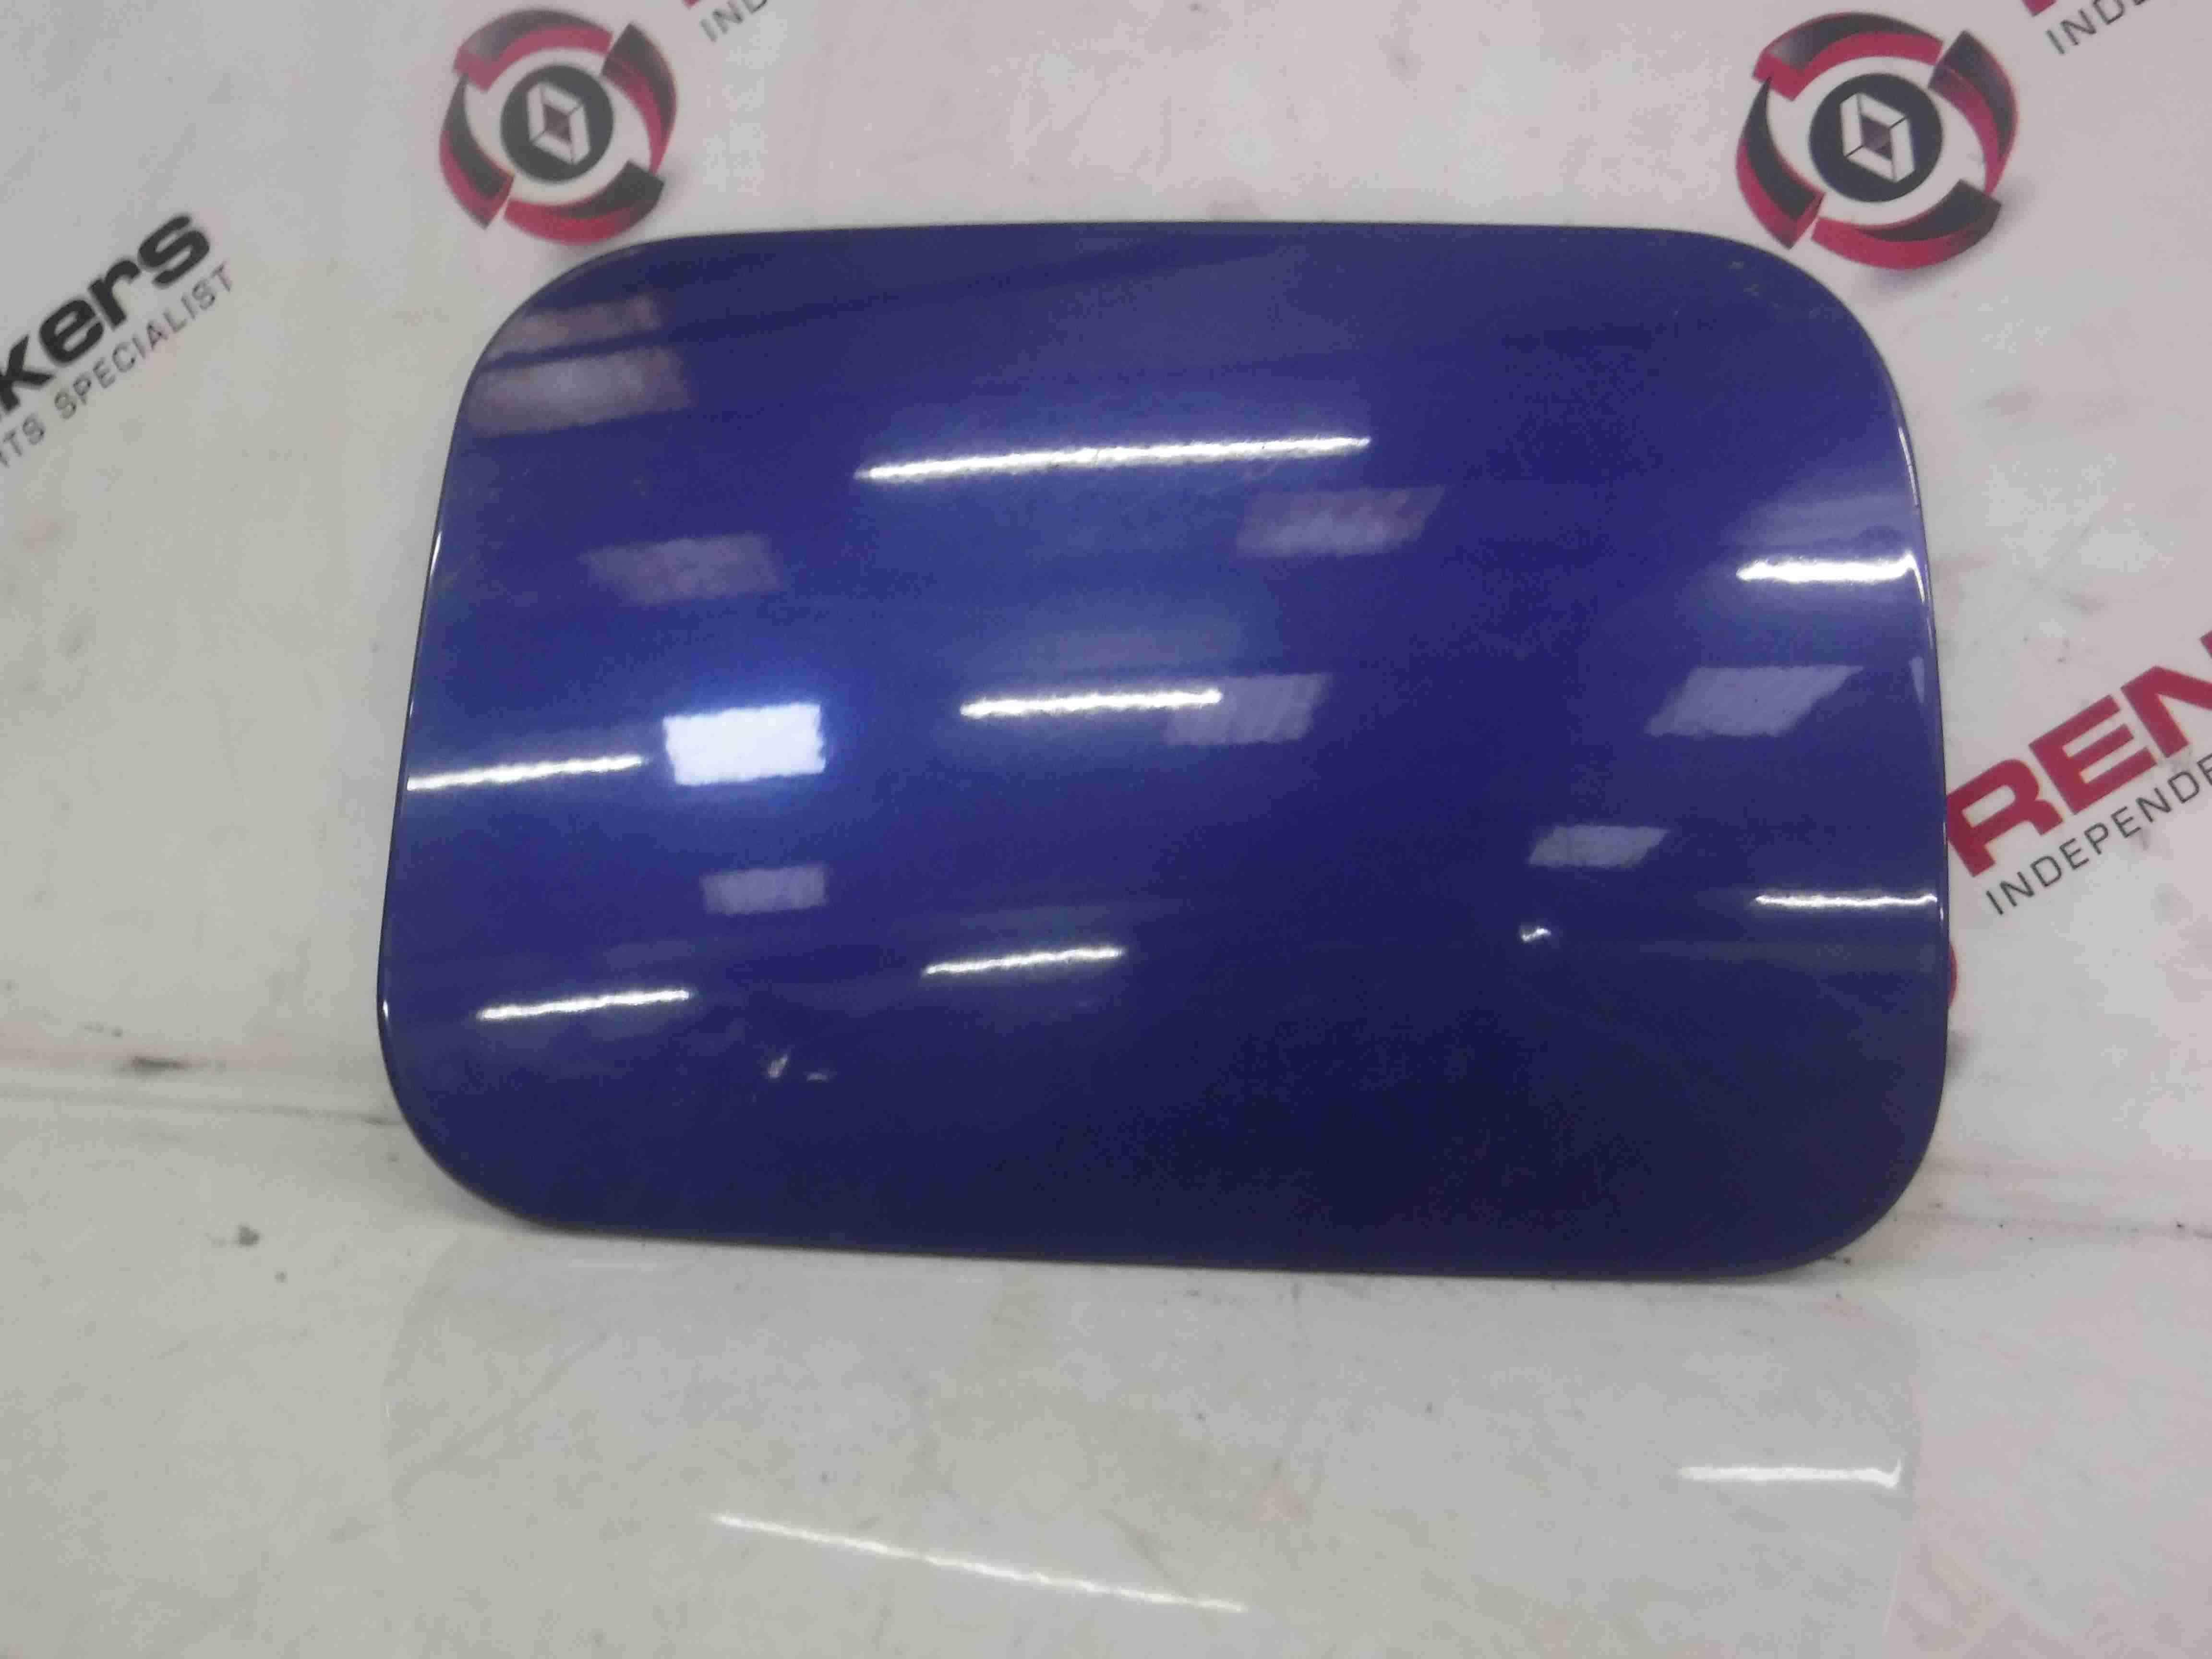 Renault Megane Sport 225 2002-2008 Fuel Flap Cover Blue TEJ41 8200073760